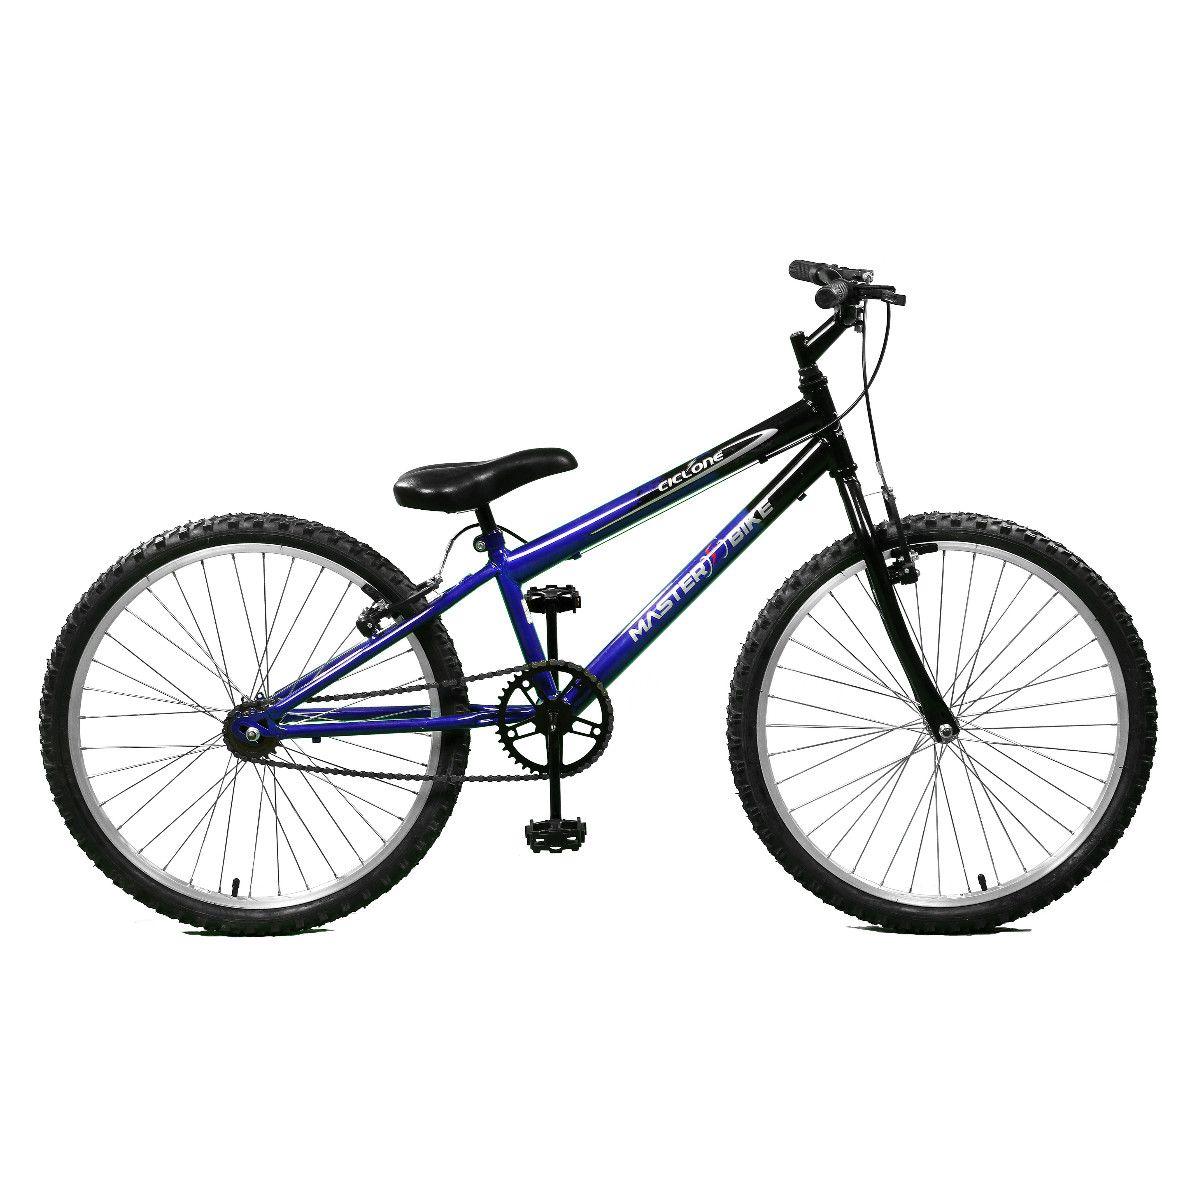 Bicicleta Master Bike Aro 24 Ciclone Freio V-Brake Azul/Preto